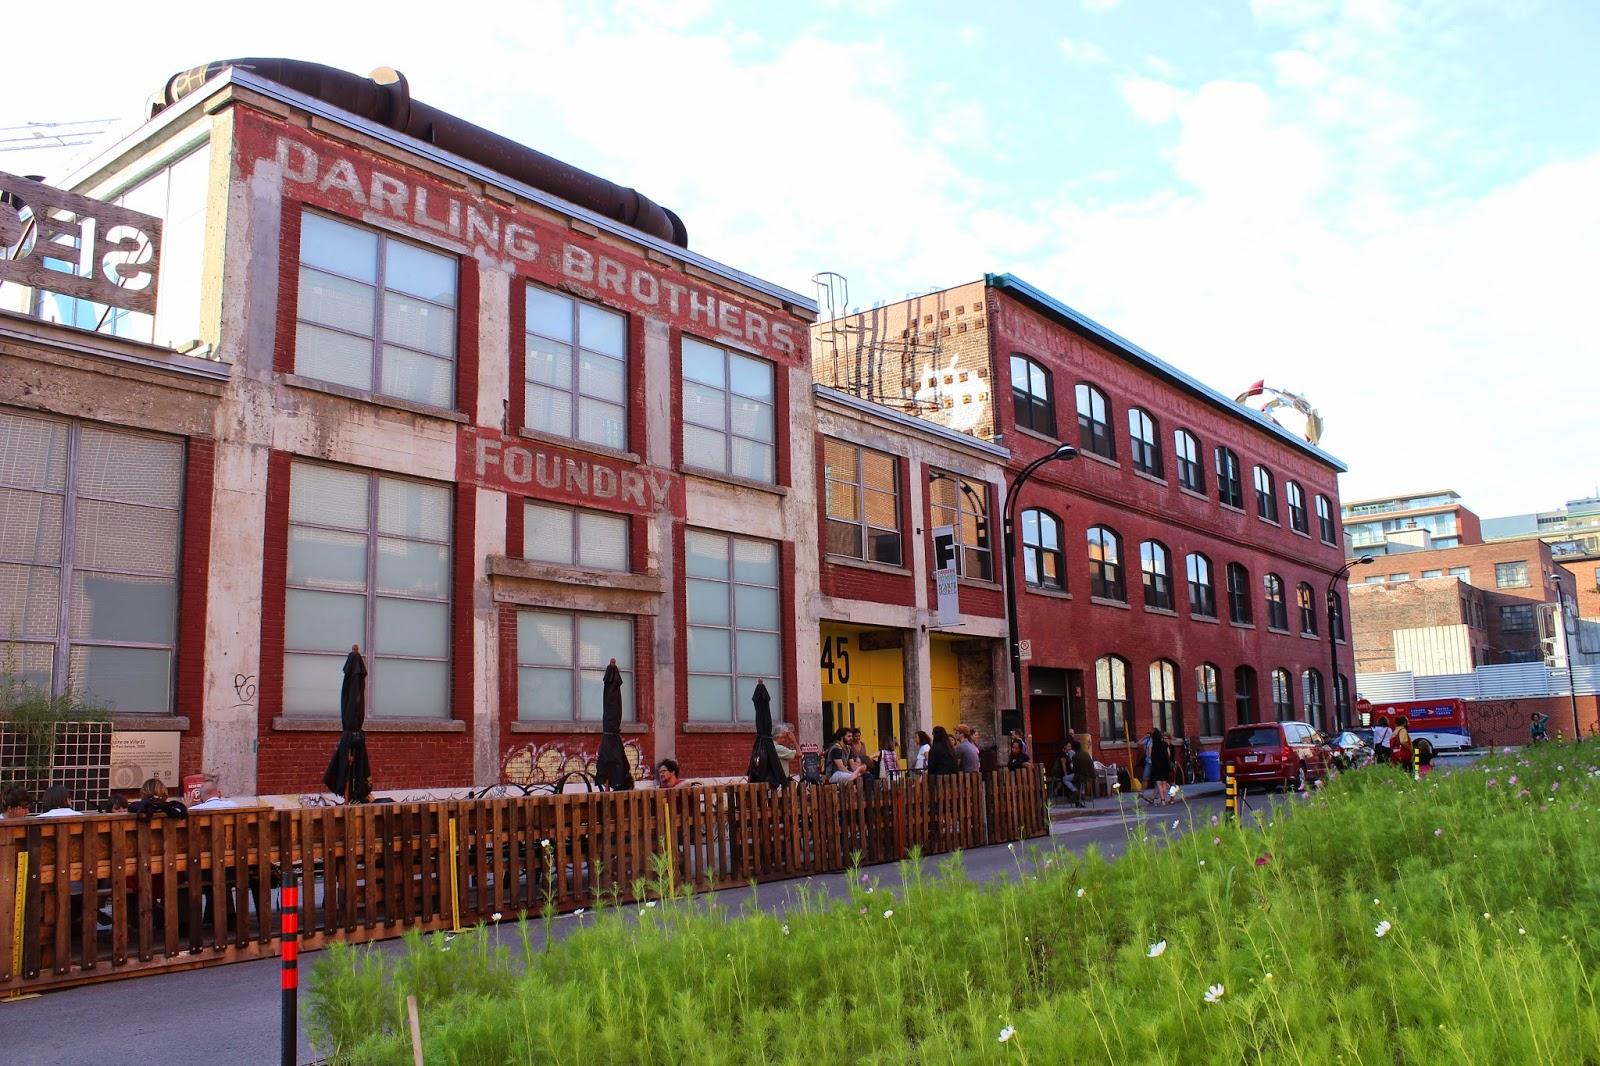 patrimoine industriel montreal : la fonderie Darling